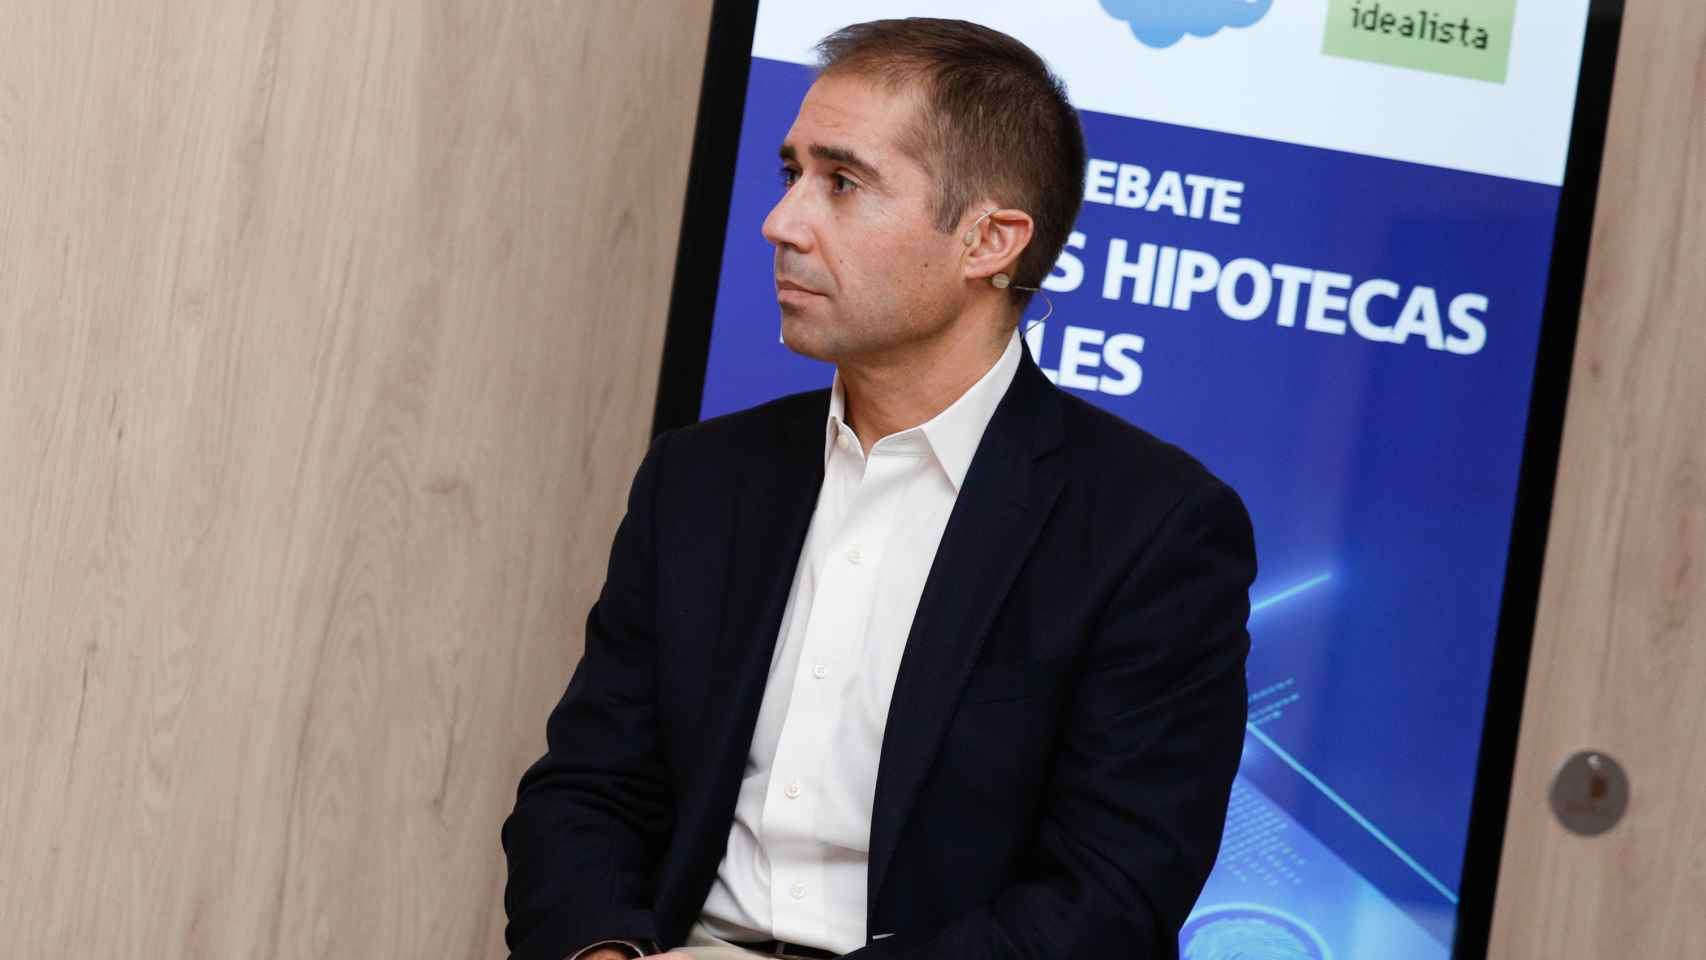 Juan Villén, director de idealista/hipotecas